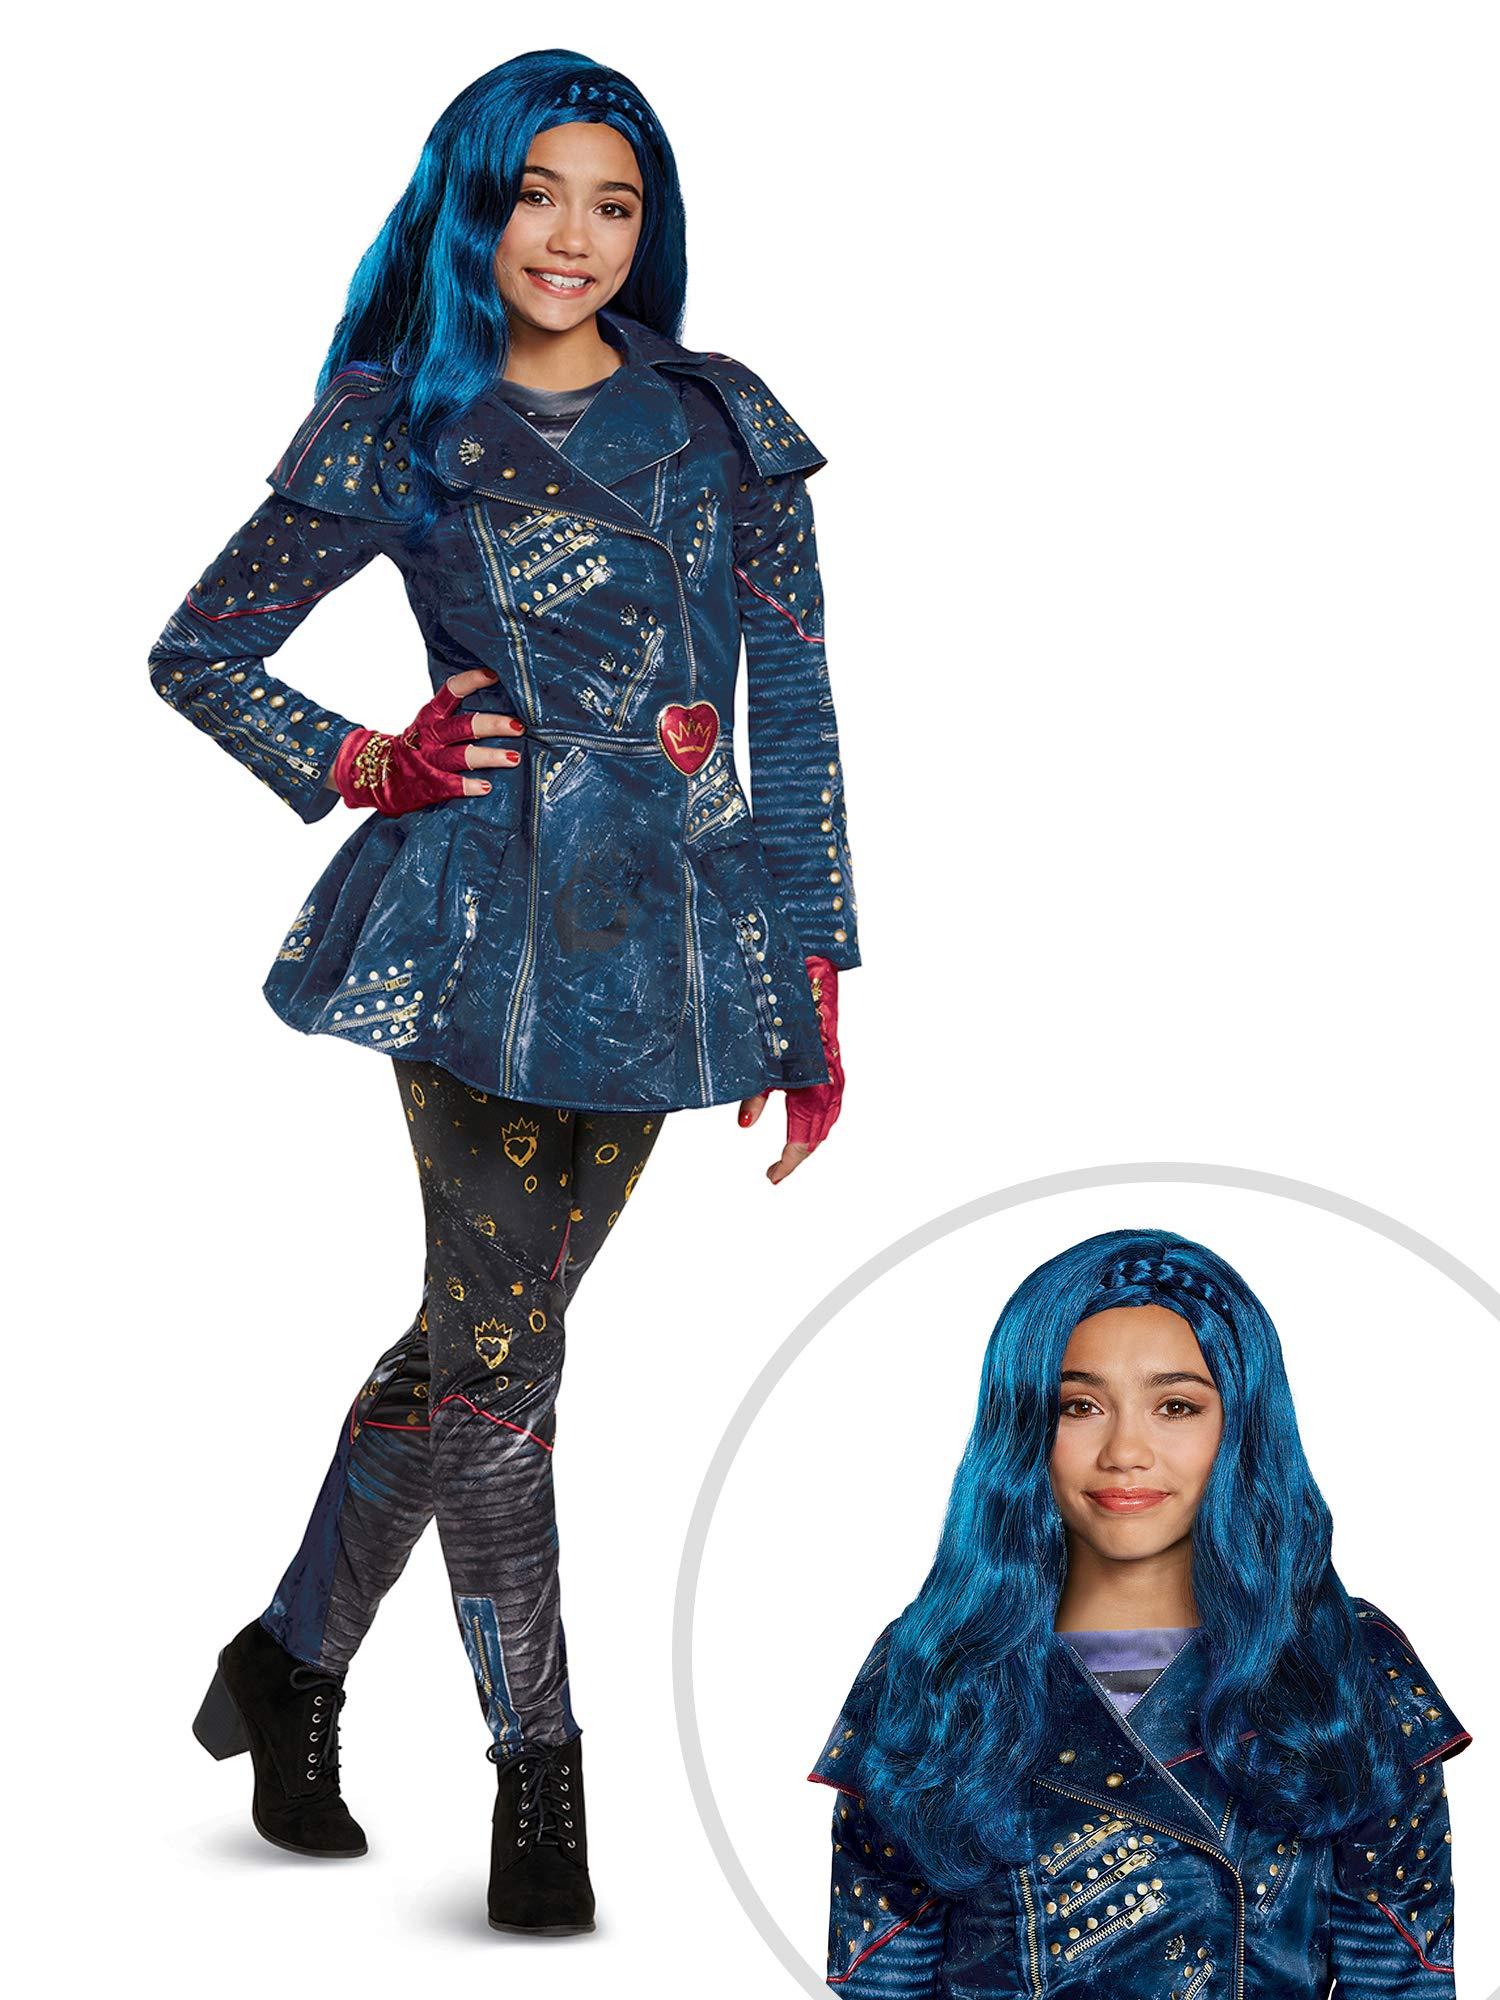 Descendants Evie Costume Kit Kids Medium With Wig